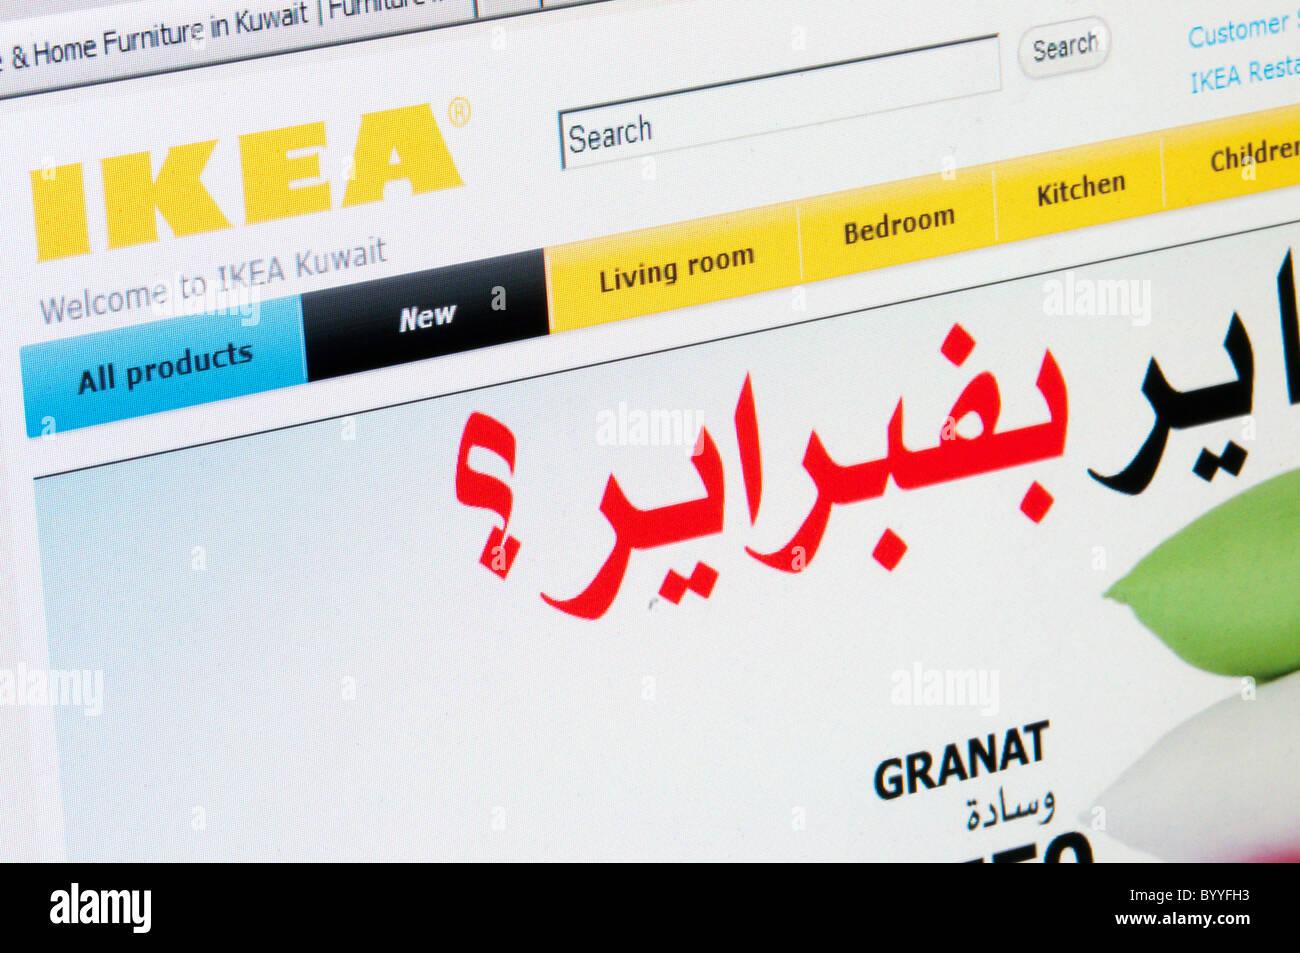 The IKEA Kuwait web site. - Stock Image